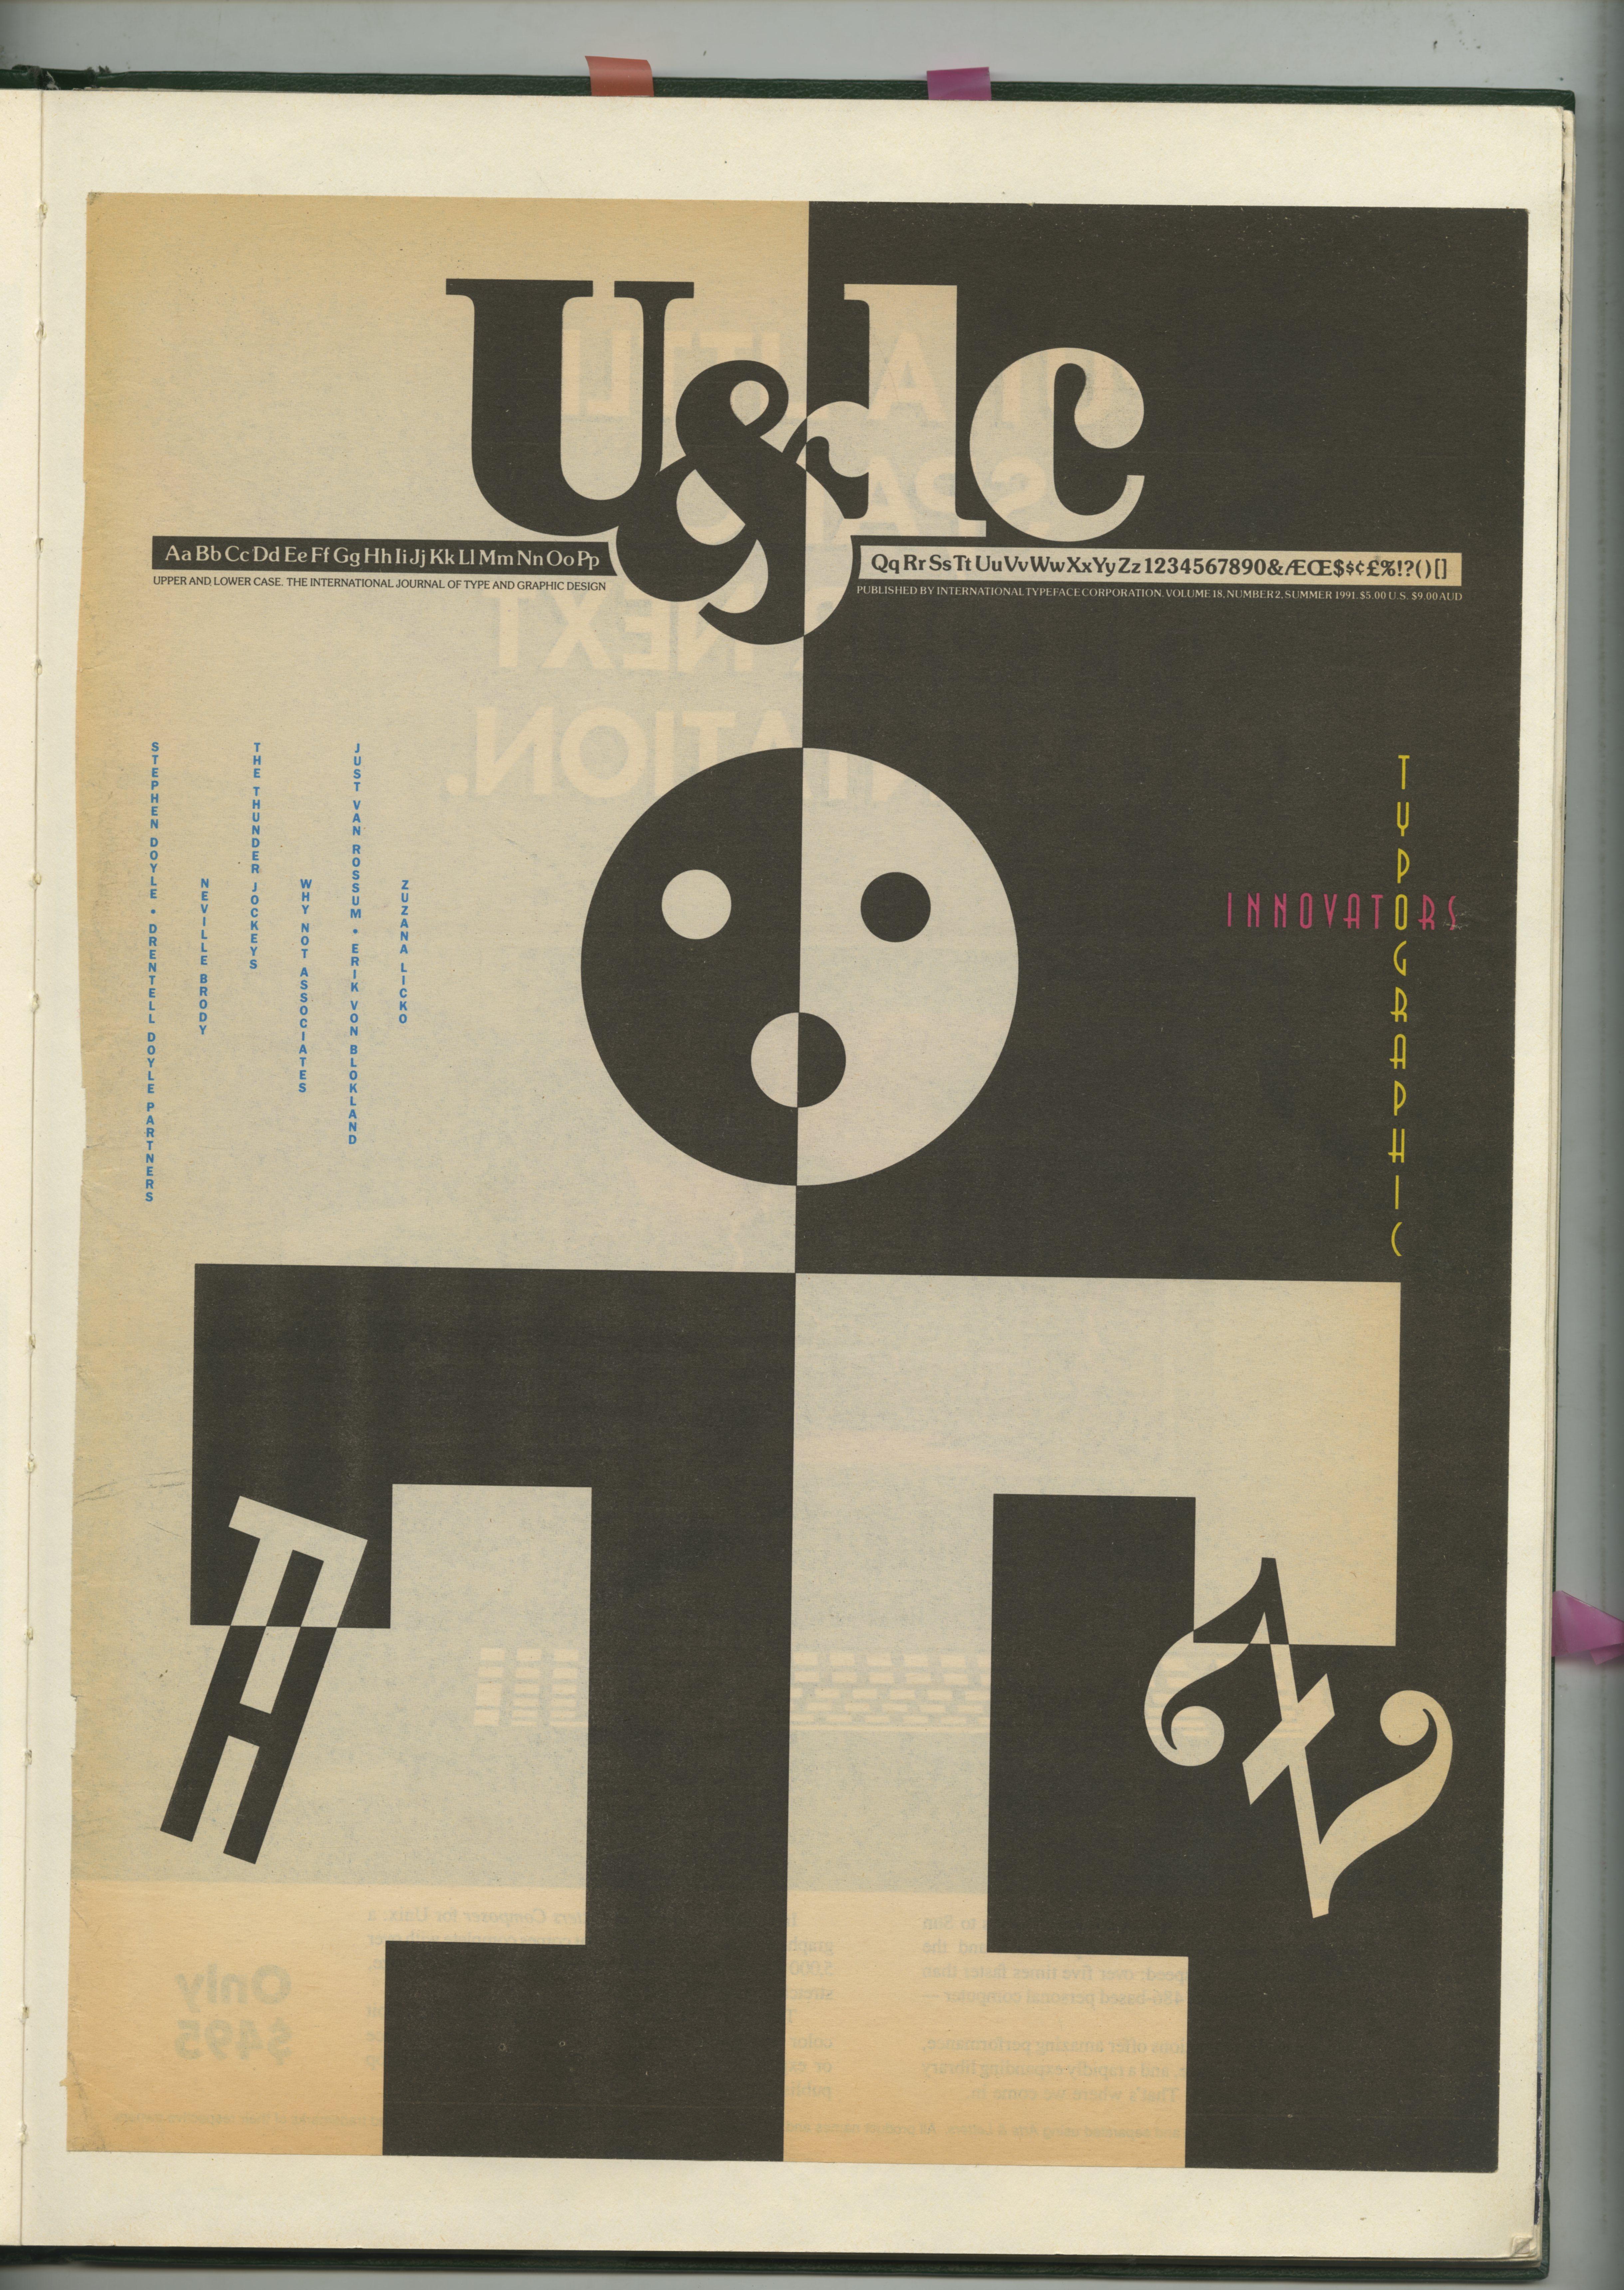 43. GREEN BOOKS: 'Type'